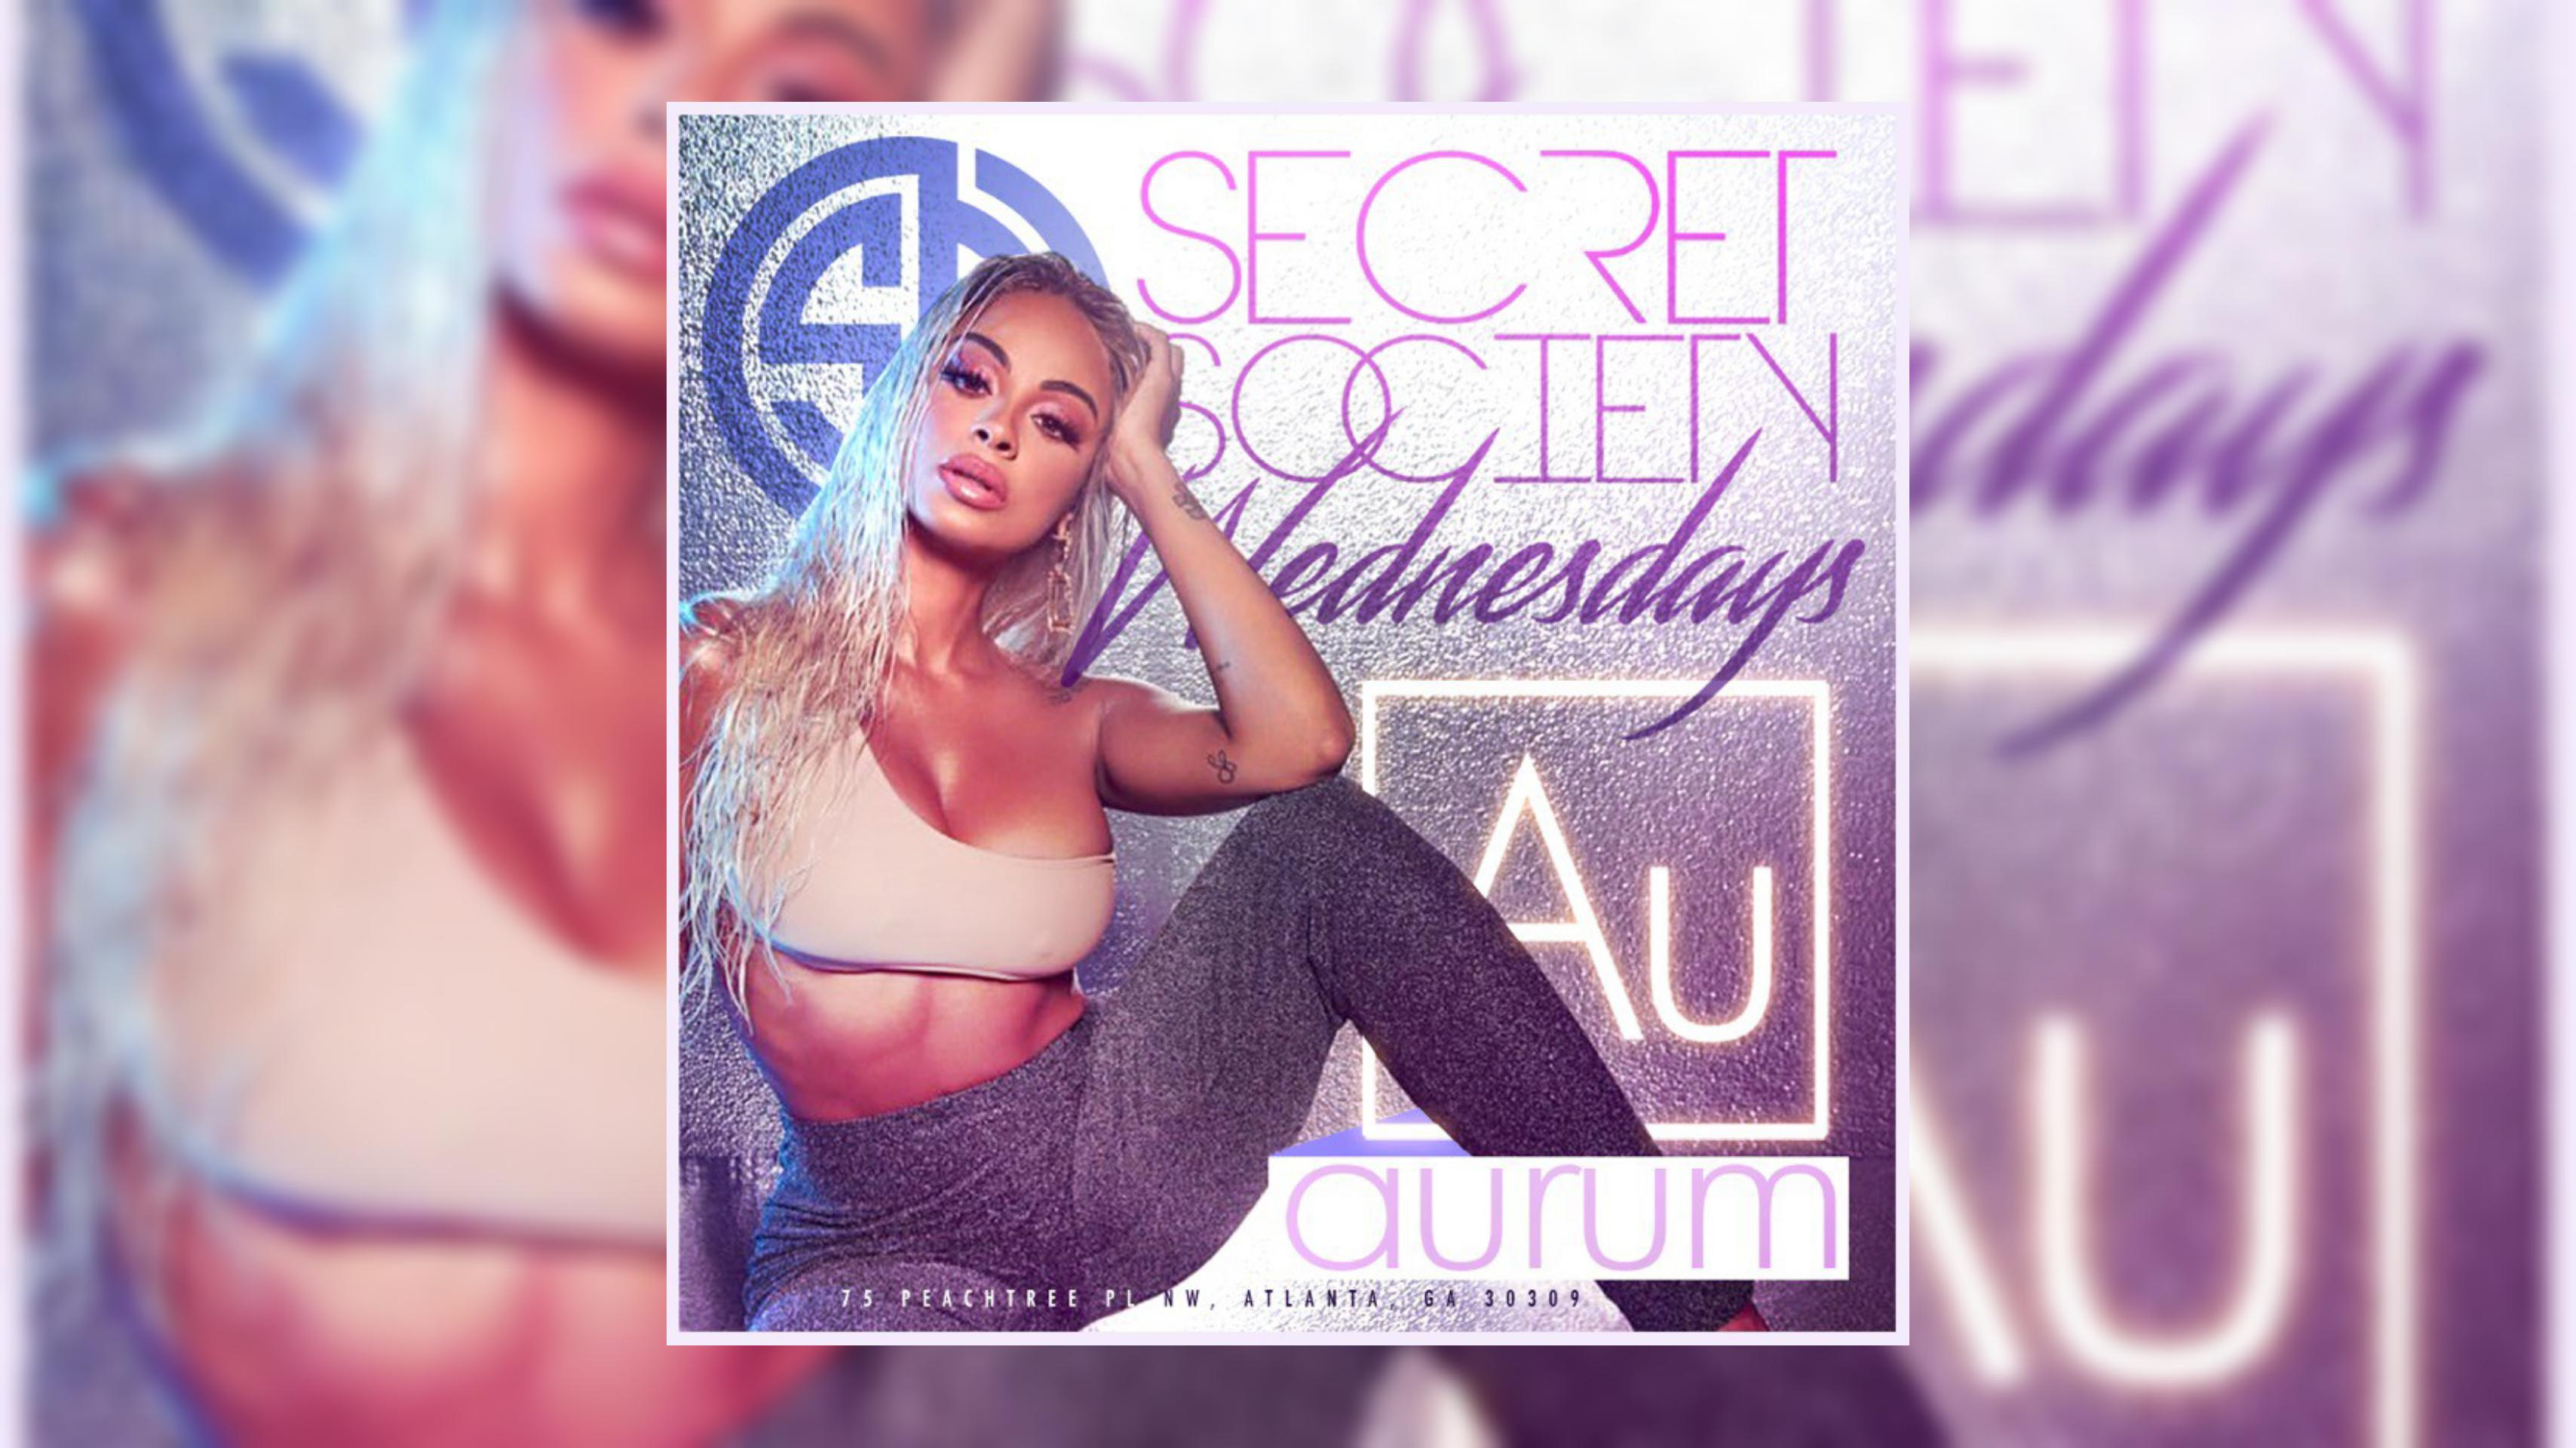 Aurum Lounge: #SecretSocietyWednesdays Enter FREE with RSVP